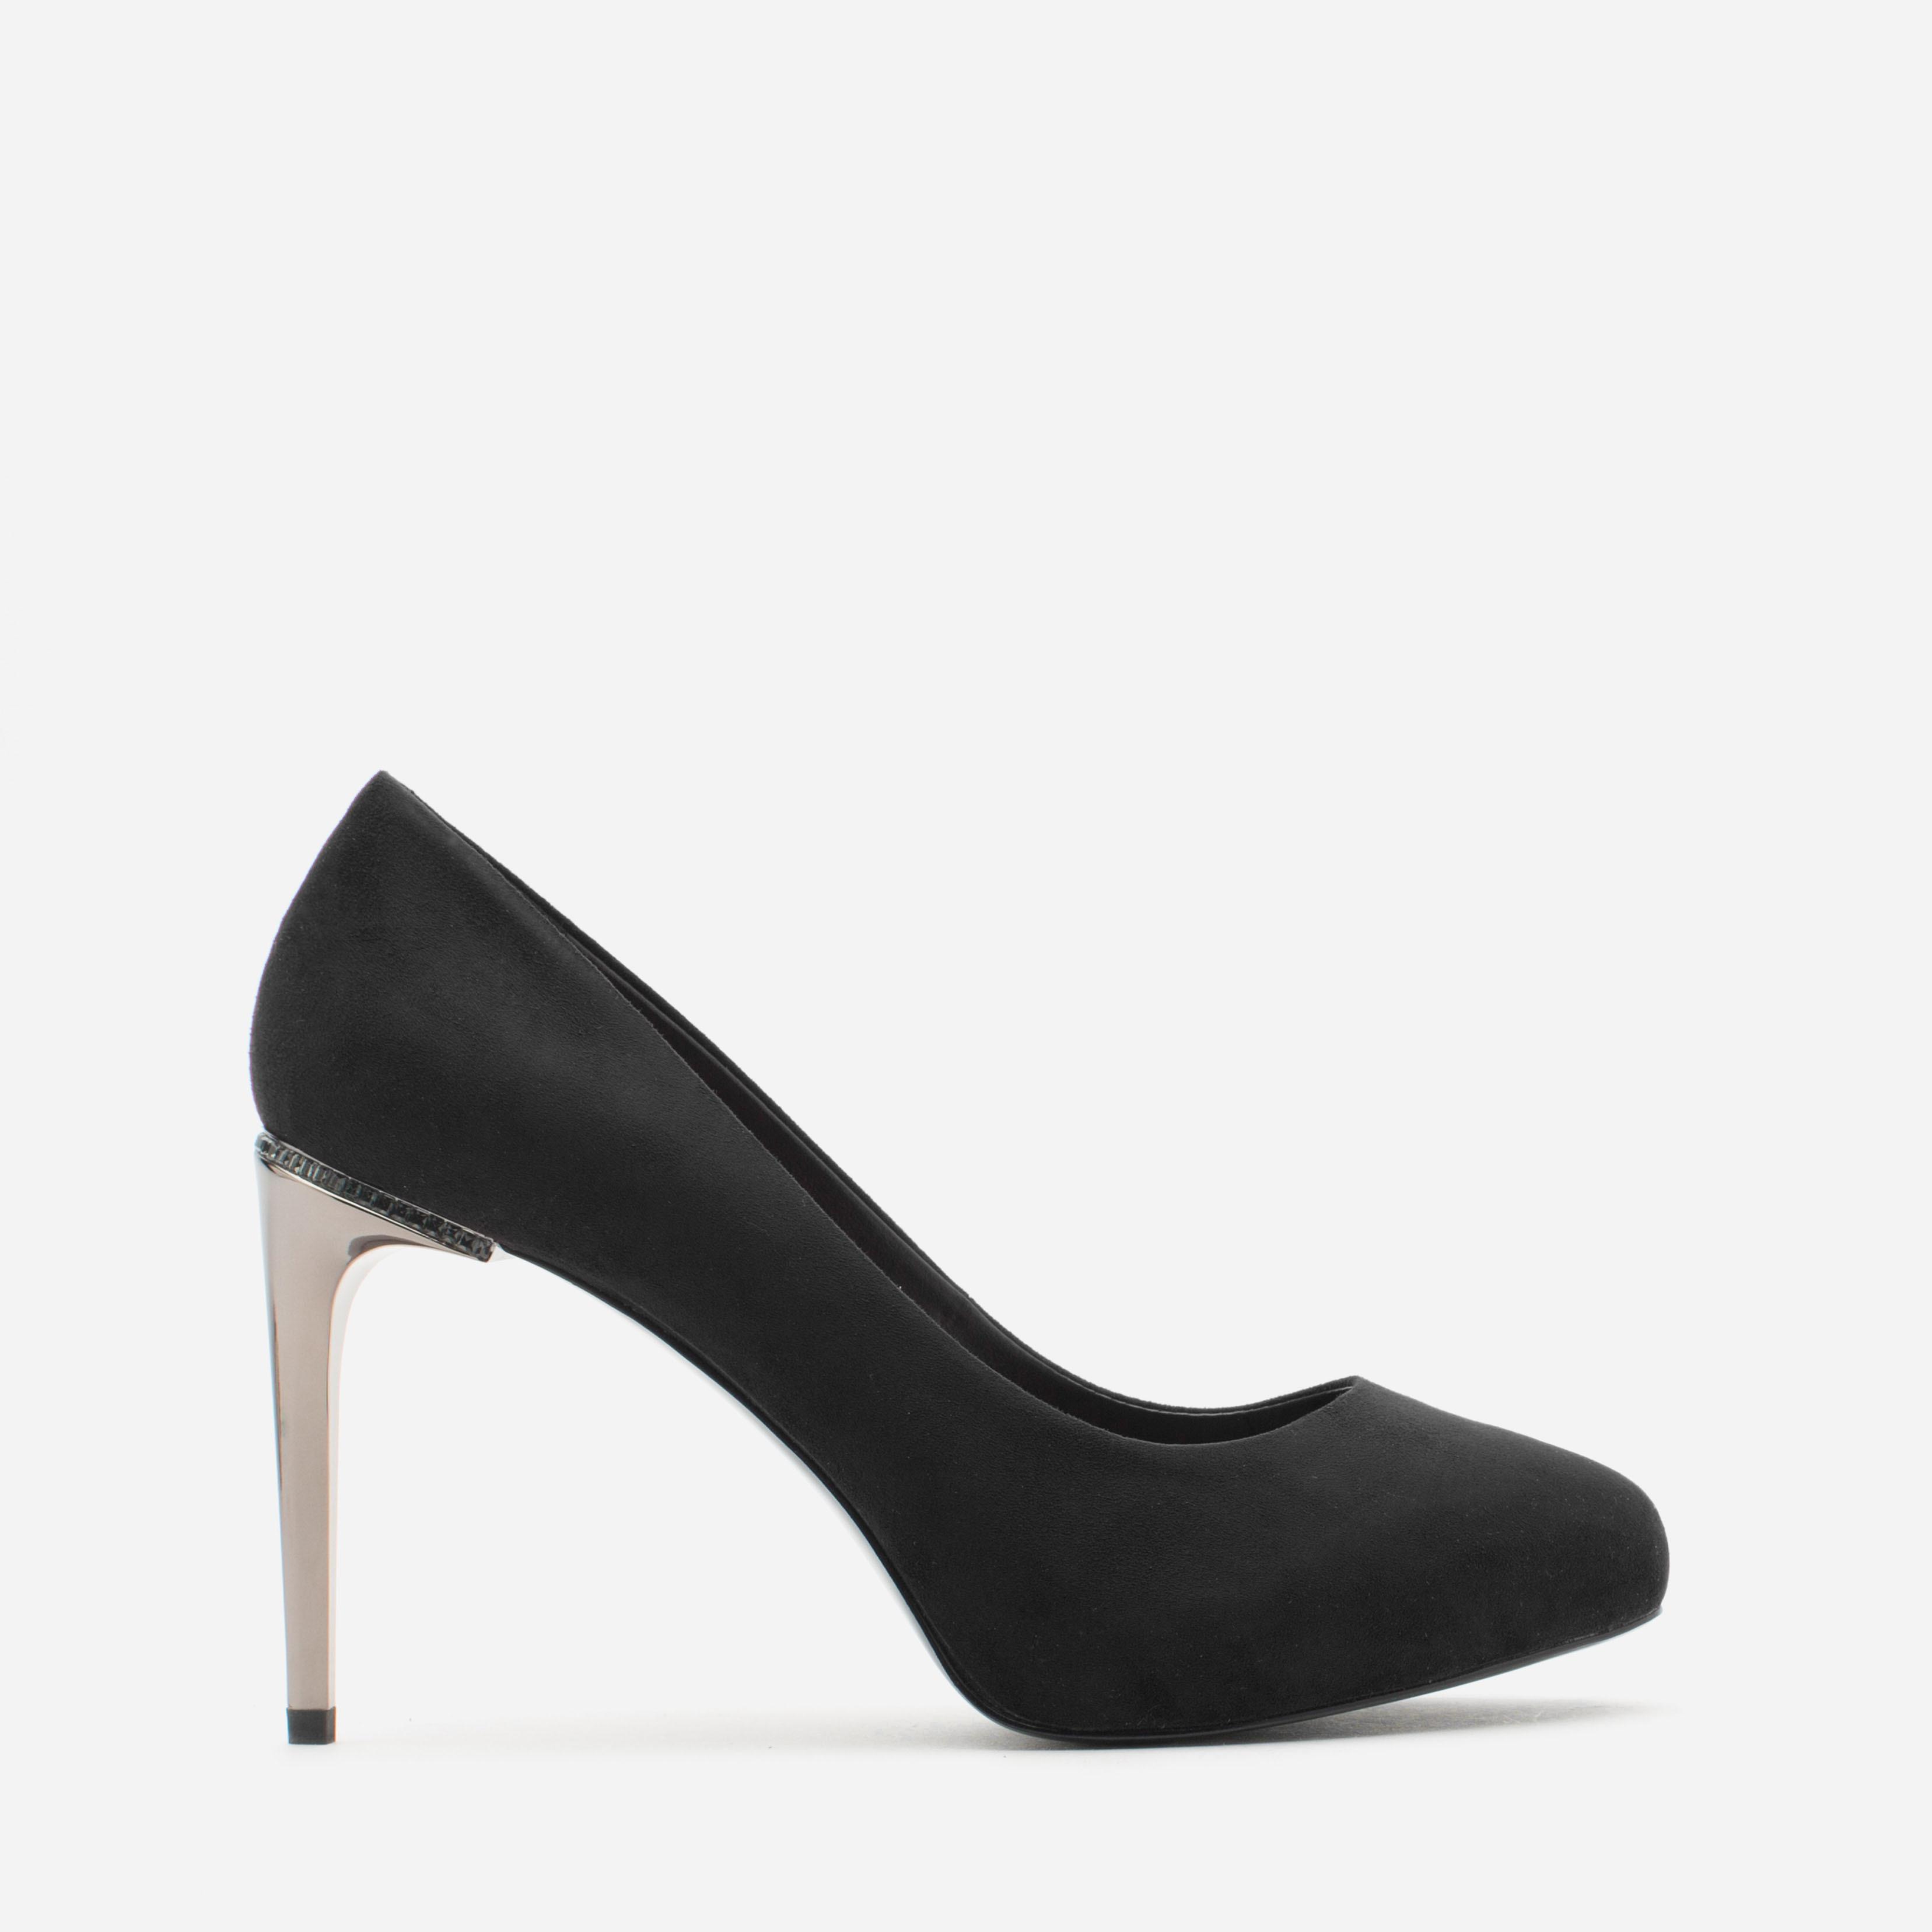 charles & keith 绒面革细跟高跟鞋 黑色 37